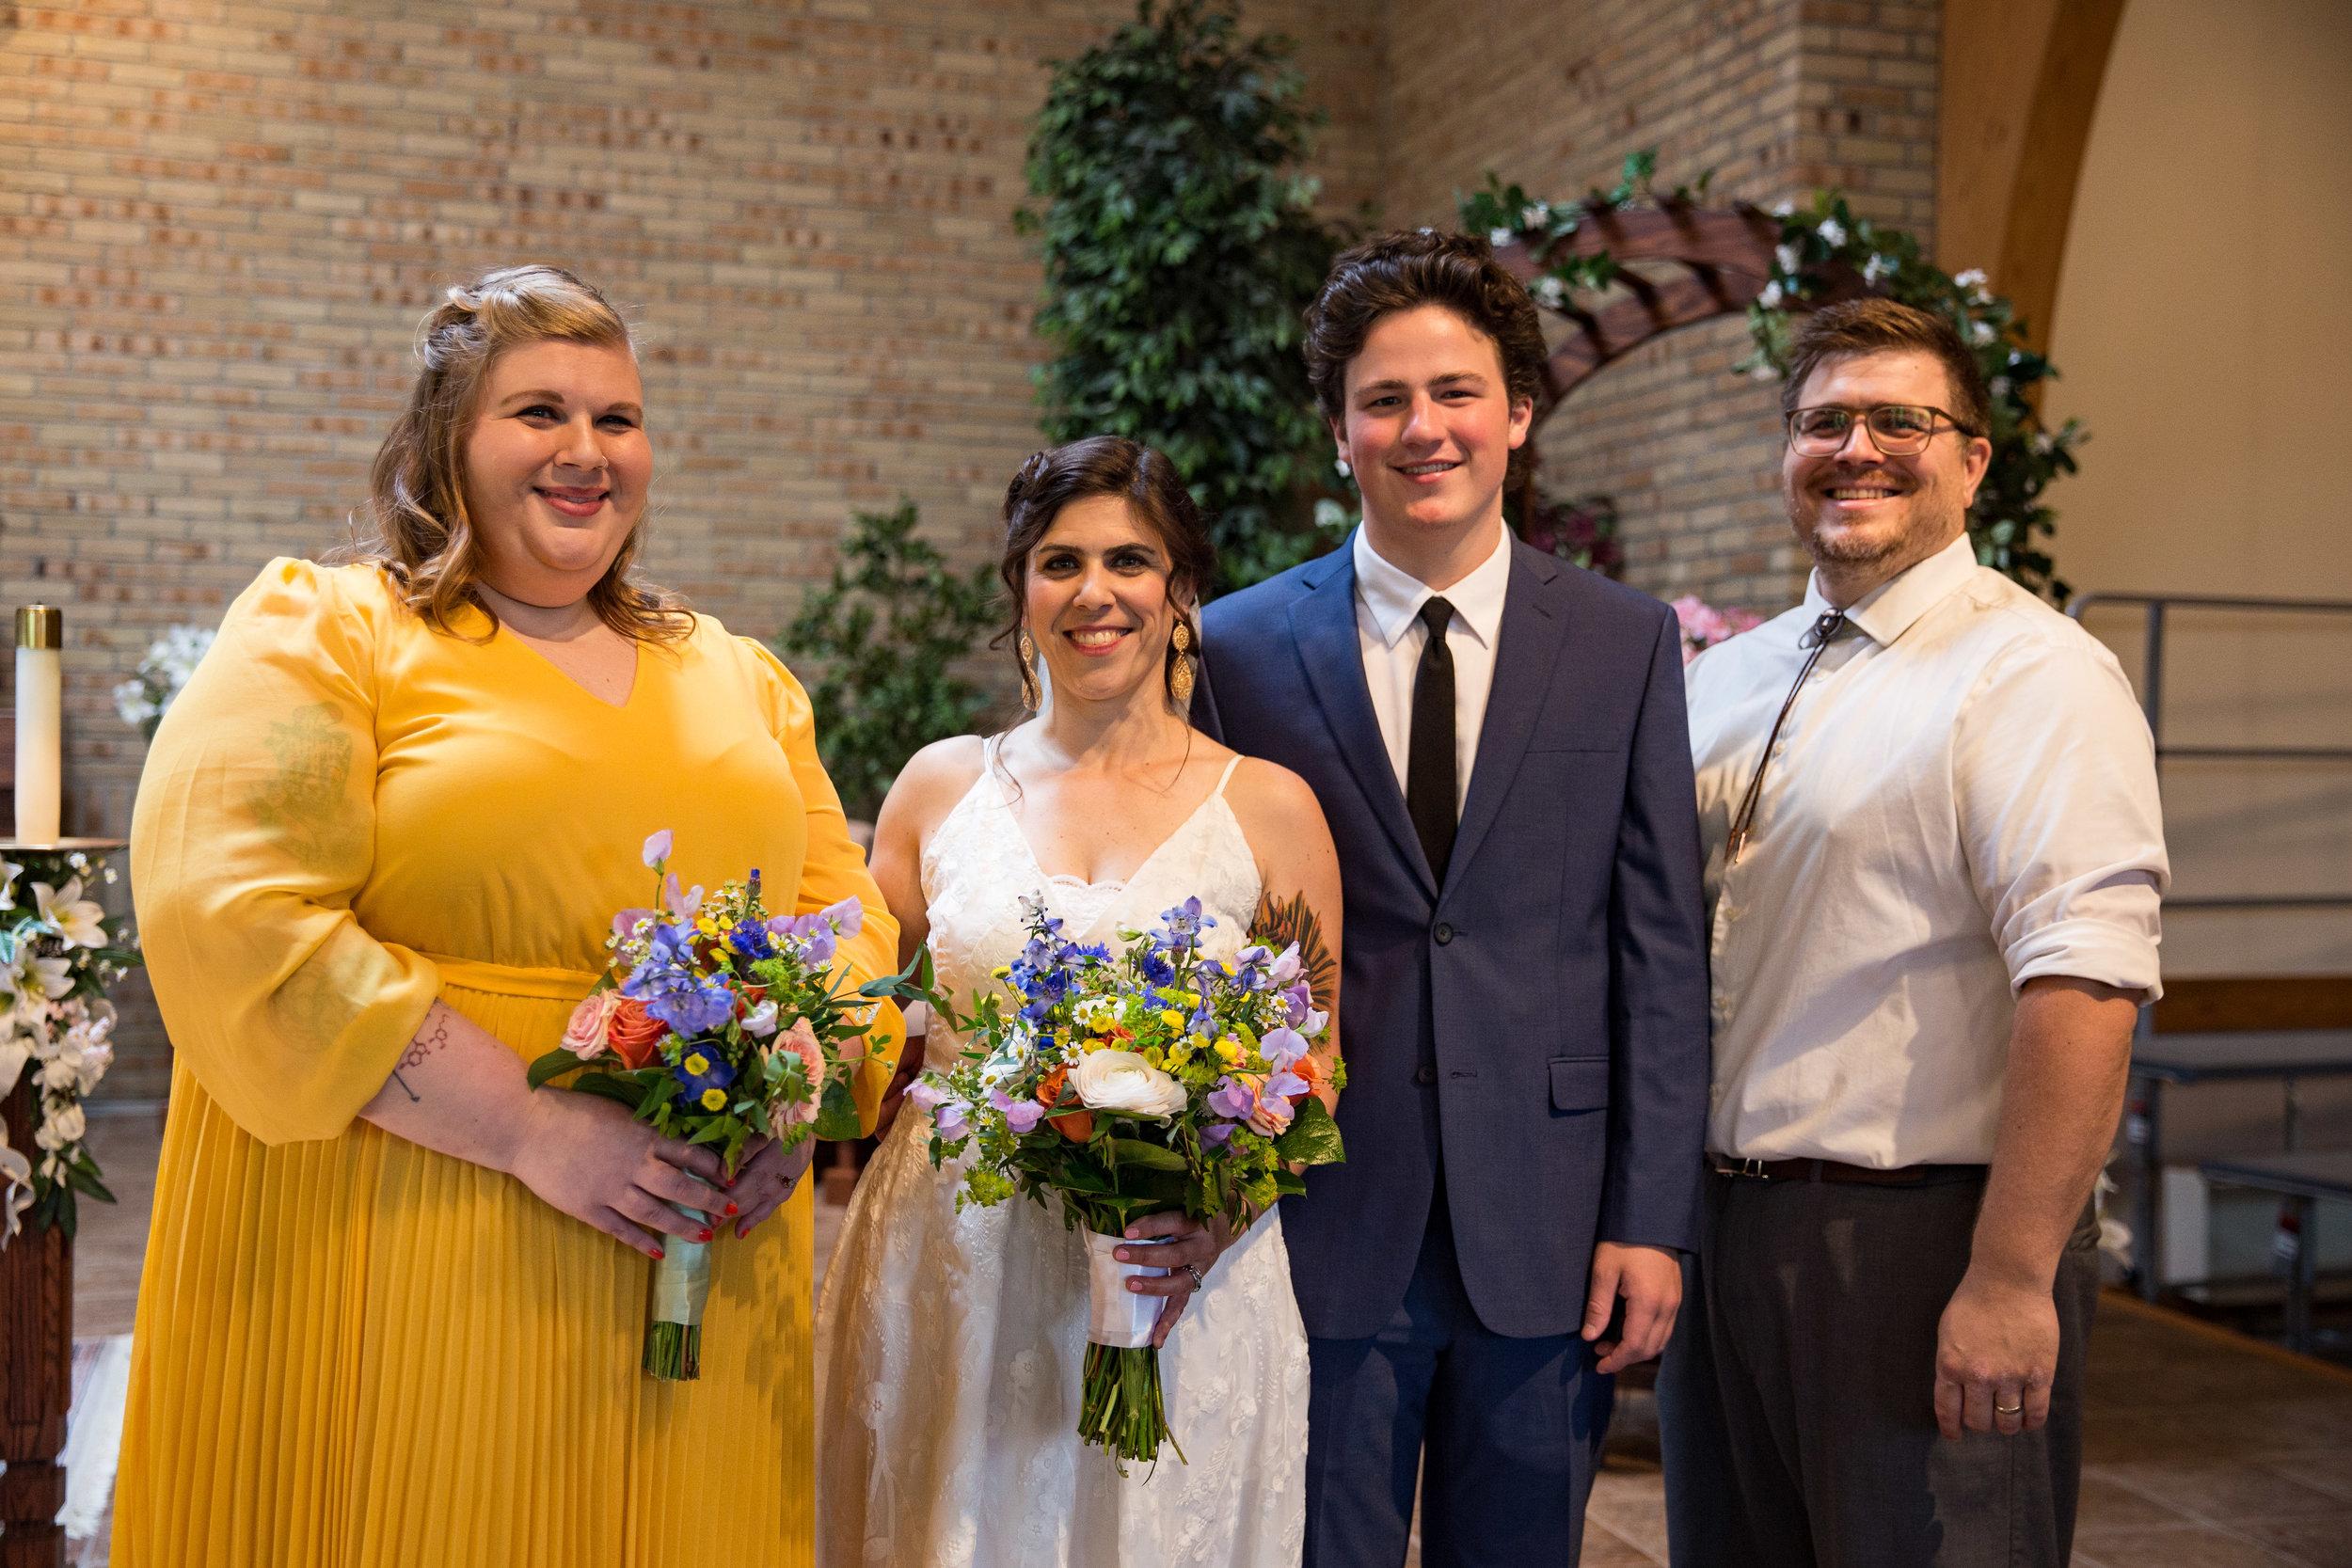 Natalie and Dallas Mooney Wedding 6-8-19_Tania Watt Photography-201.jpg